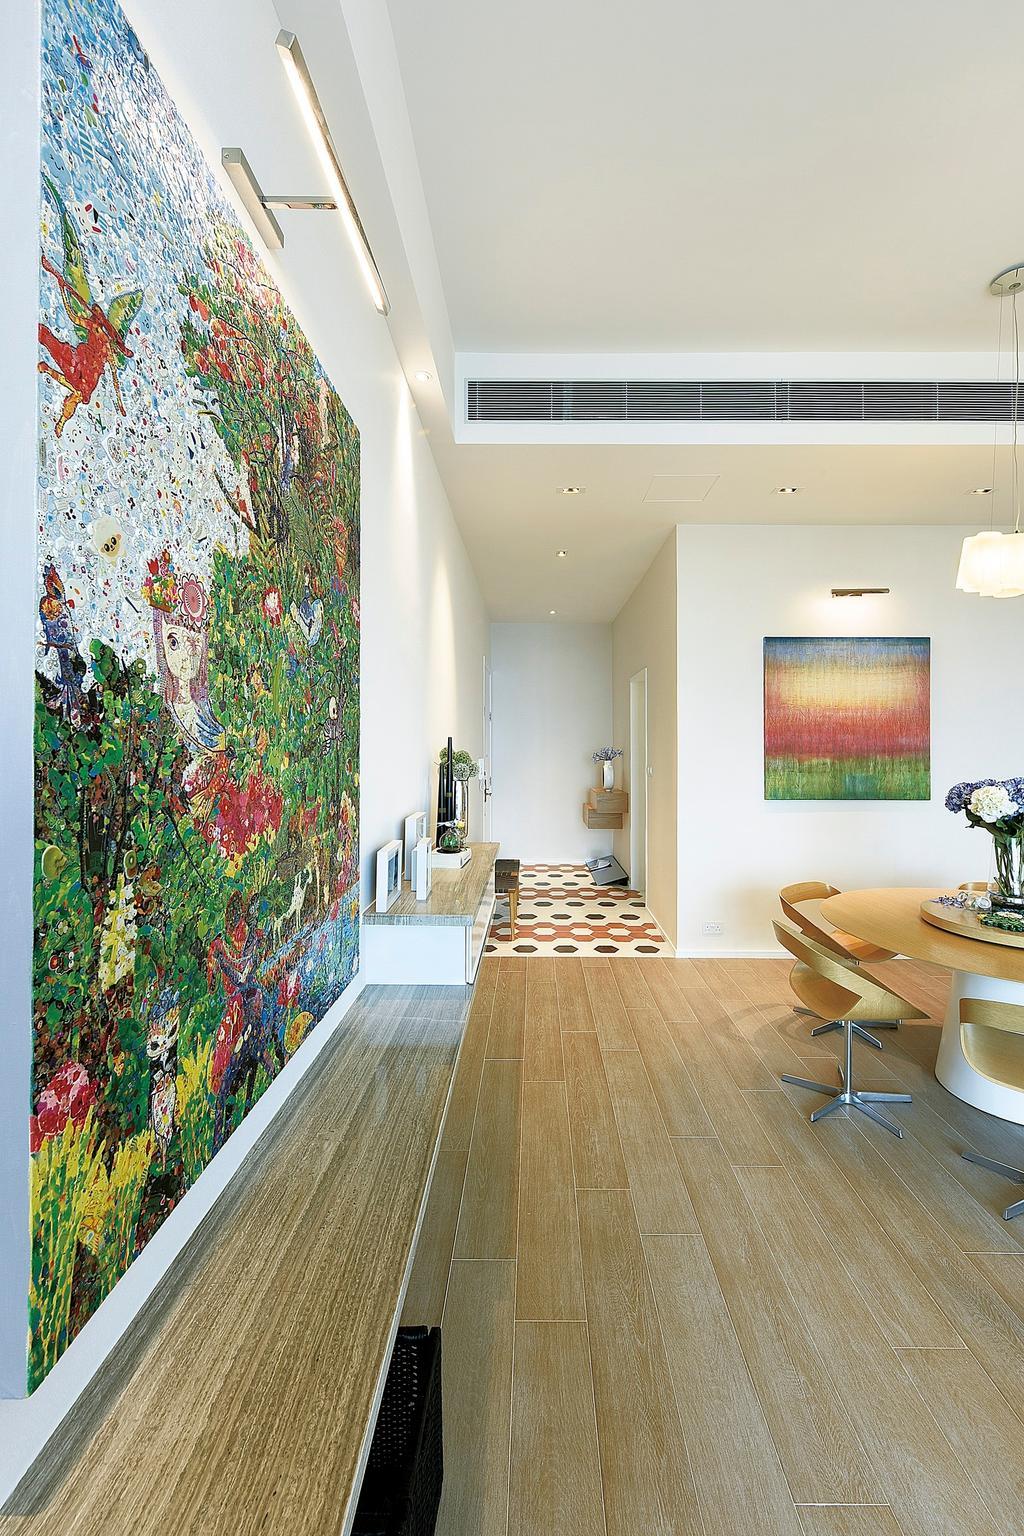 摩登, 私家樓, 客廳, Deerhill Bay, 室內設計師, 畫斯室內設計, 當代, 北歐, 飯廳, Indoors, Interior Design, Room